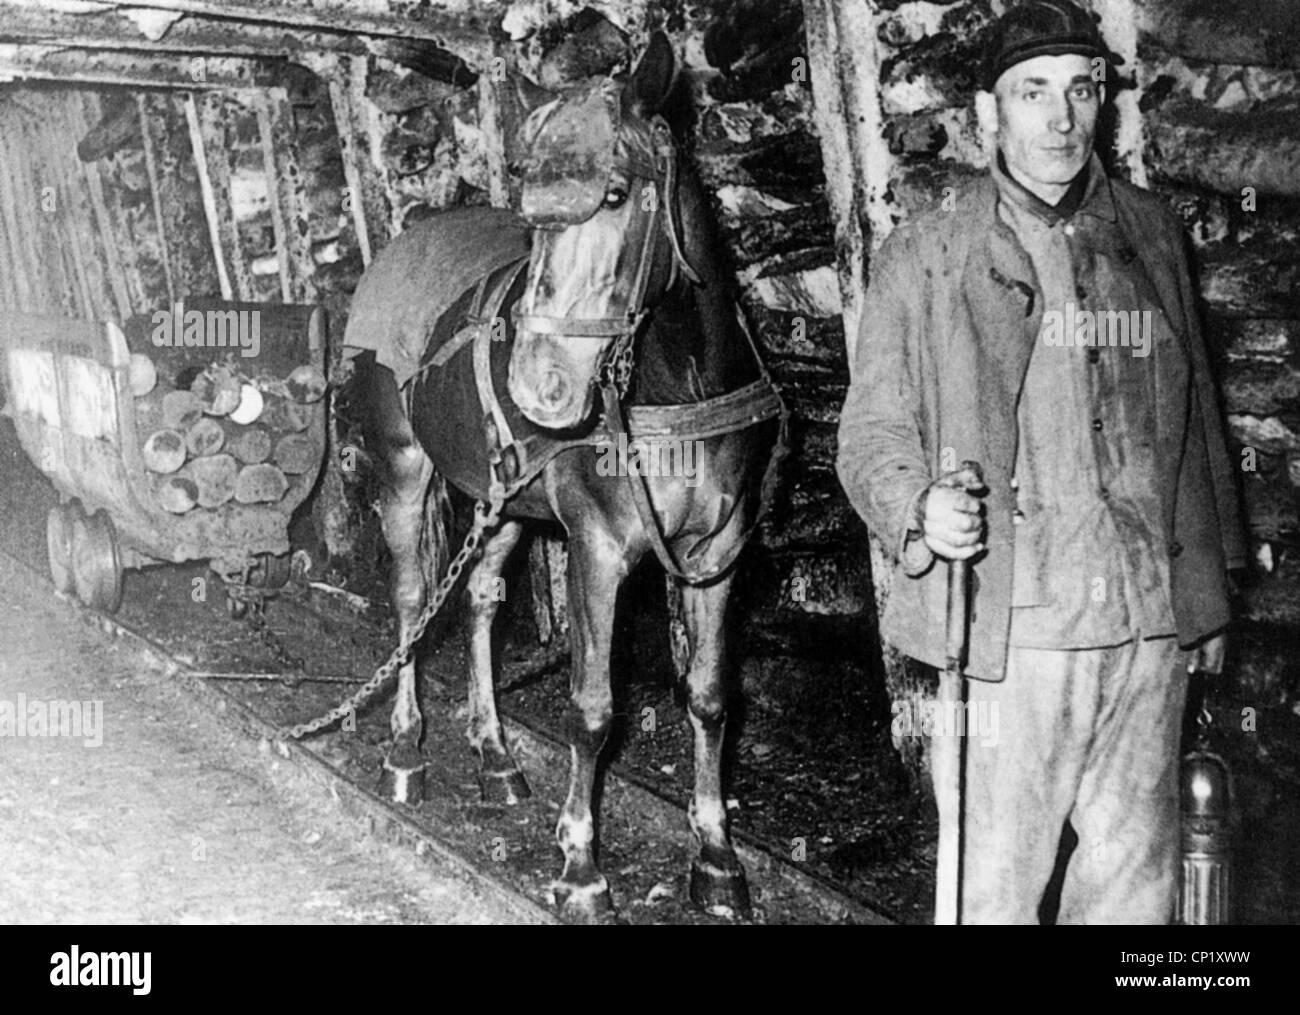 horseguide   coal mines   Horses, Pony, Coal mining